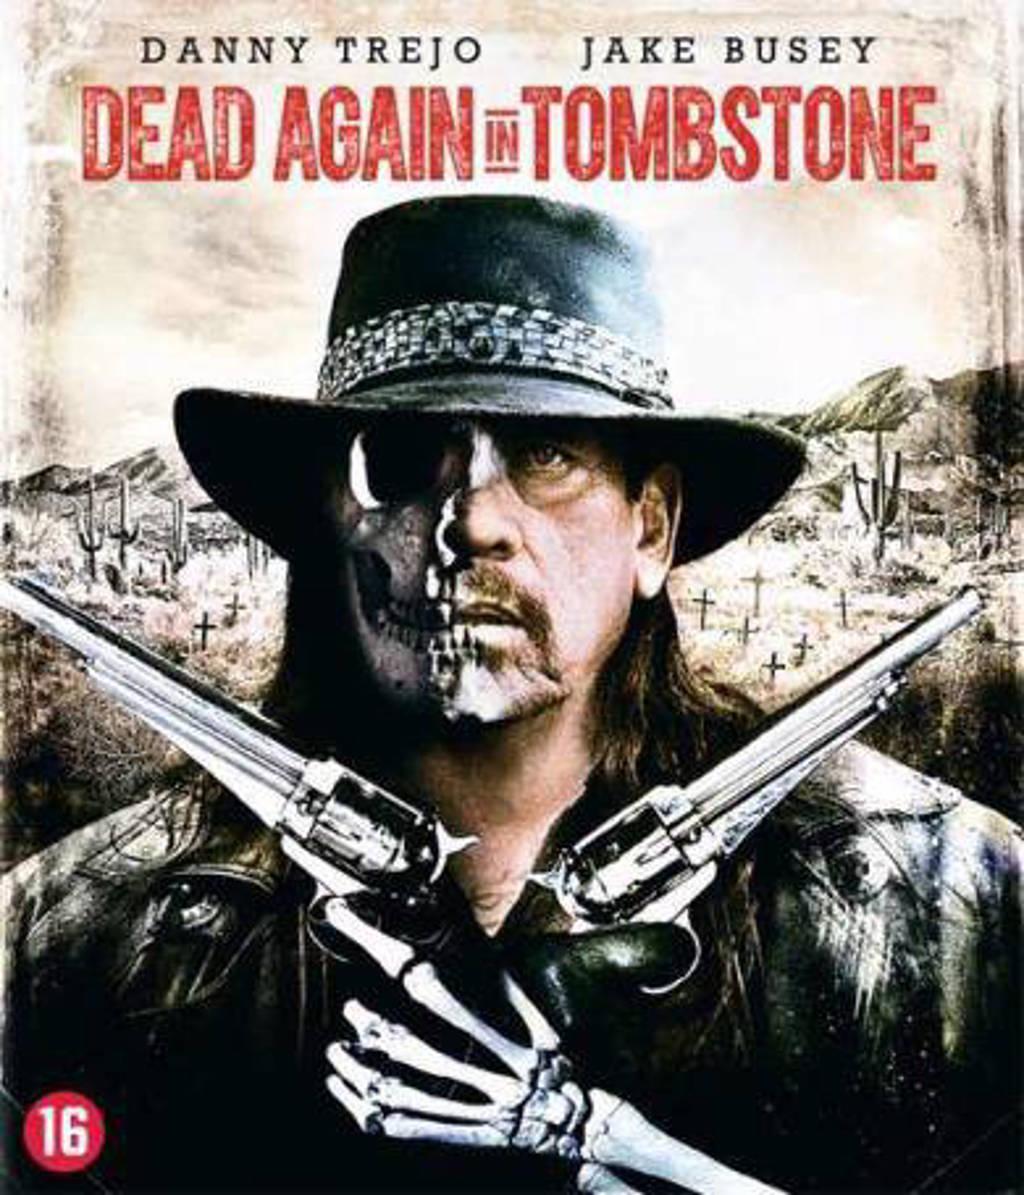 Dead again in Tombstone (Blu-ray)